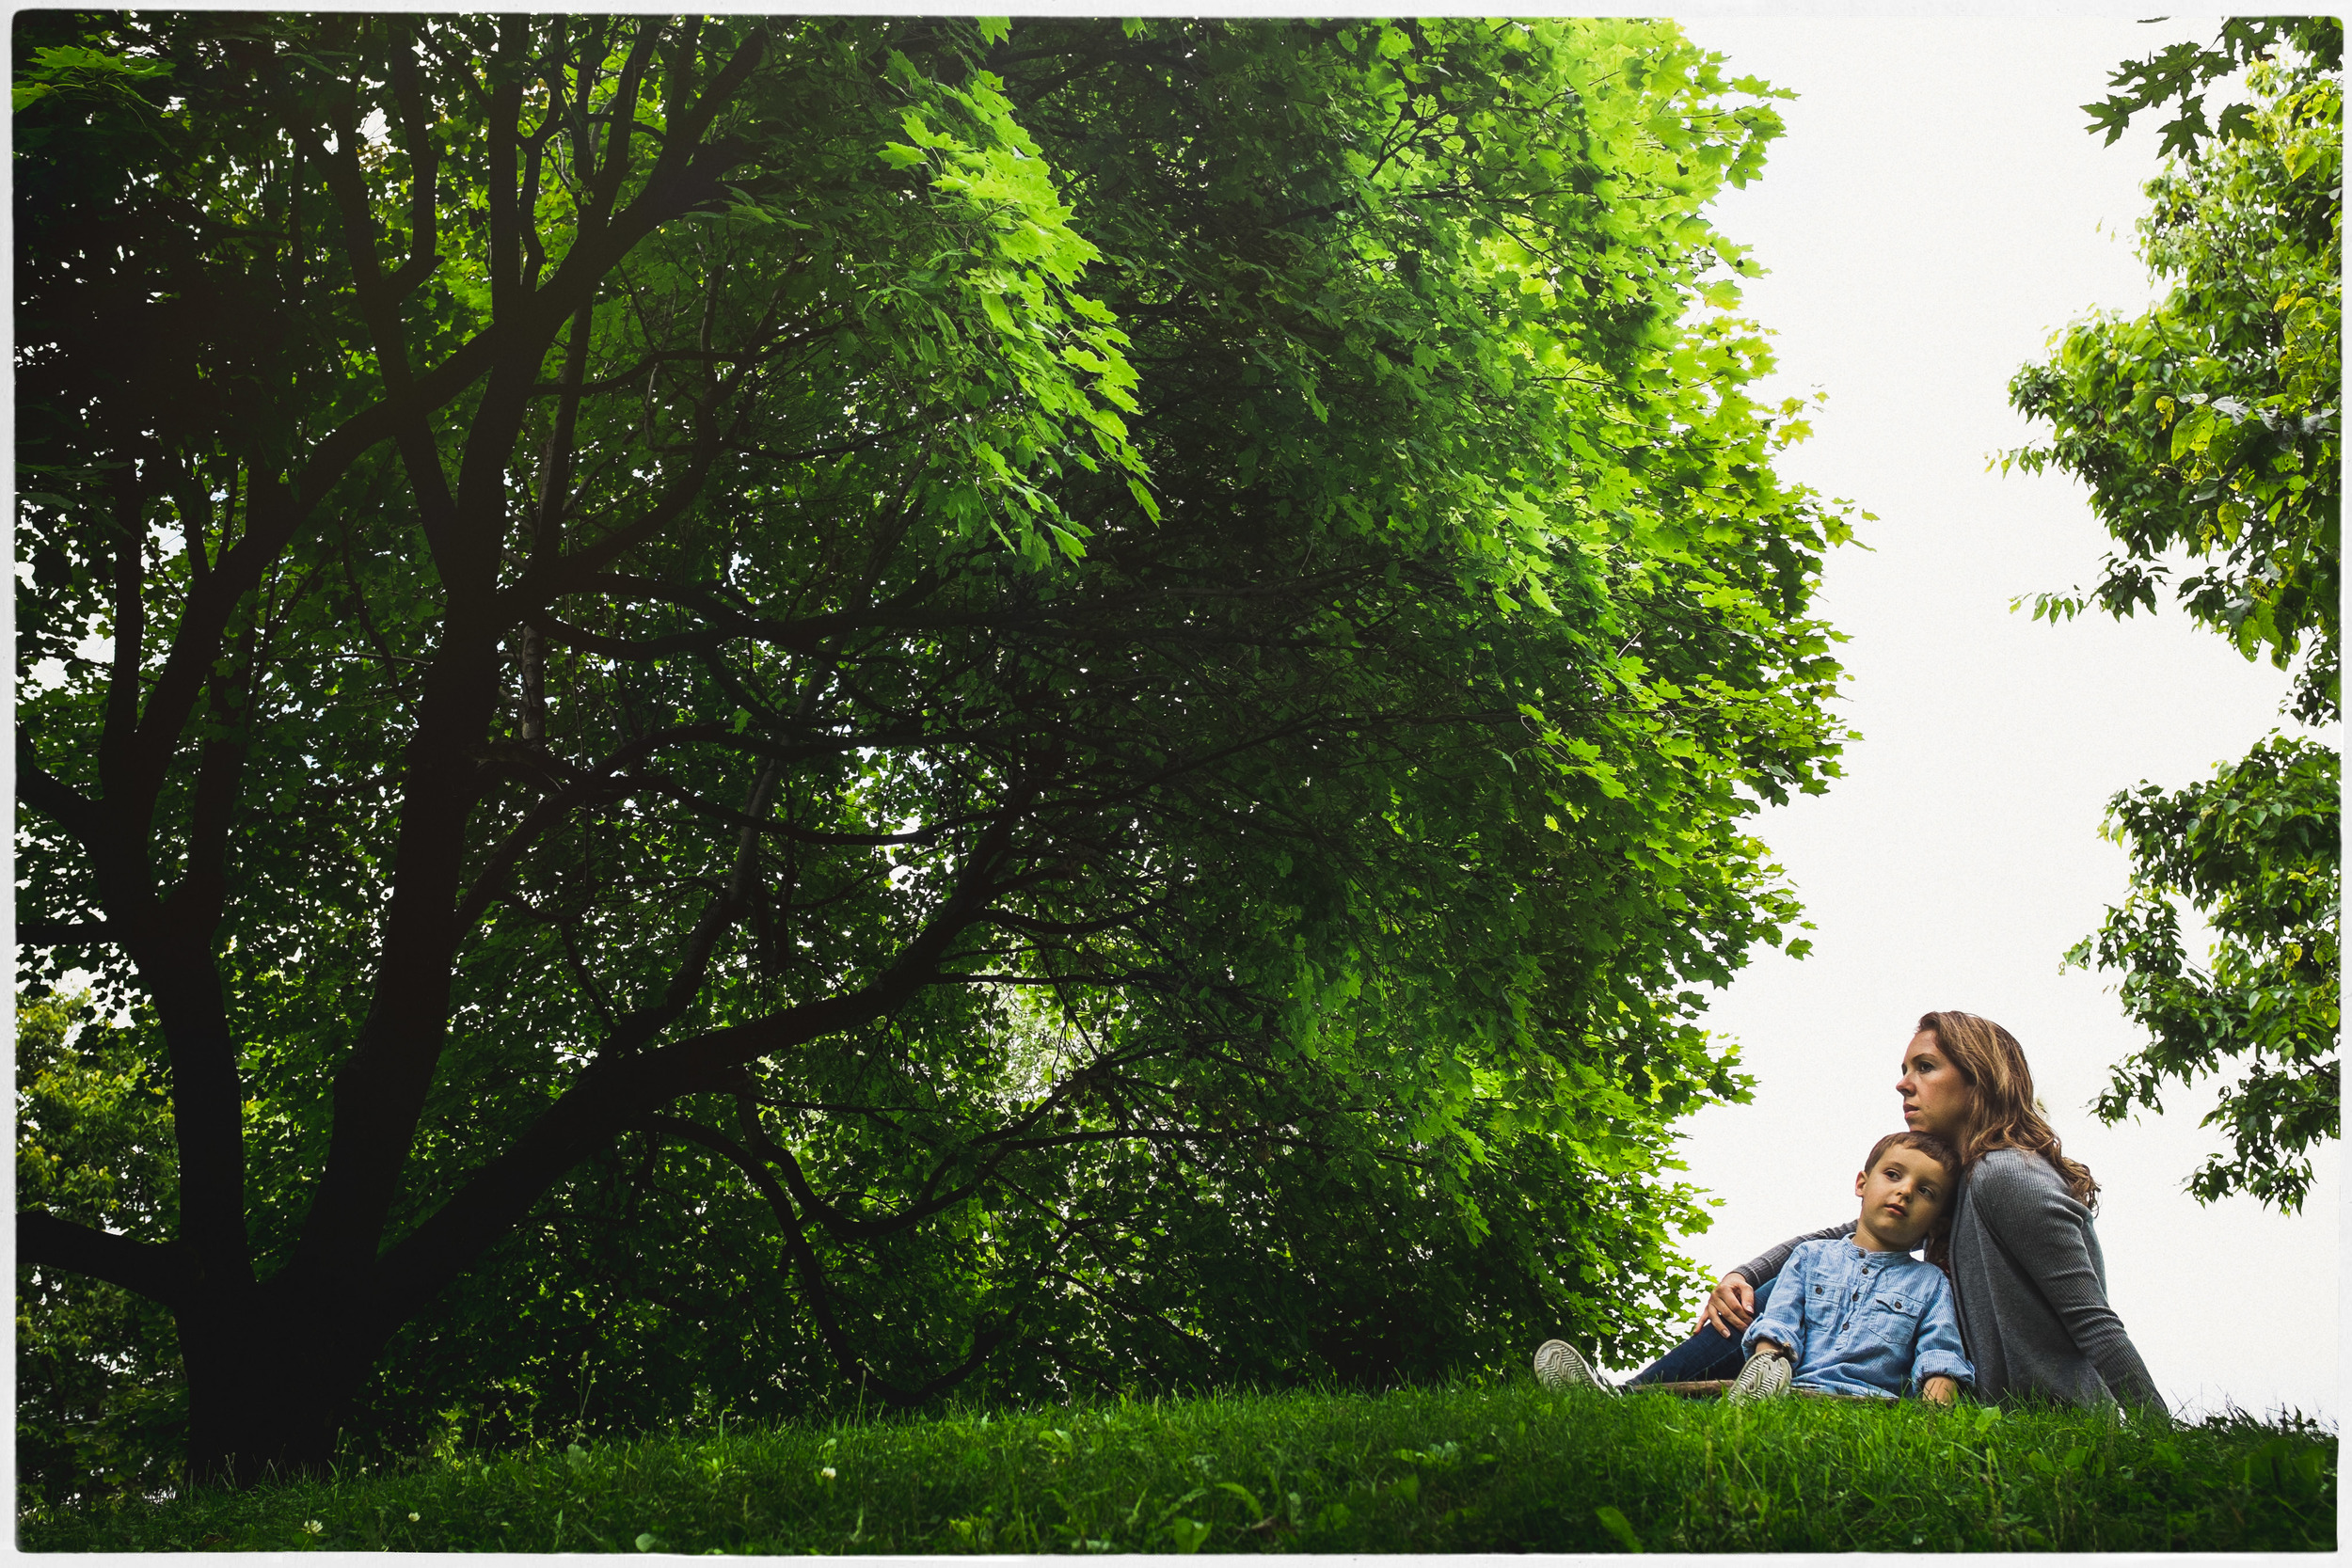 MaurizioSolisBroca.Photography20150813DSCF0973-Edit.jpg